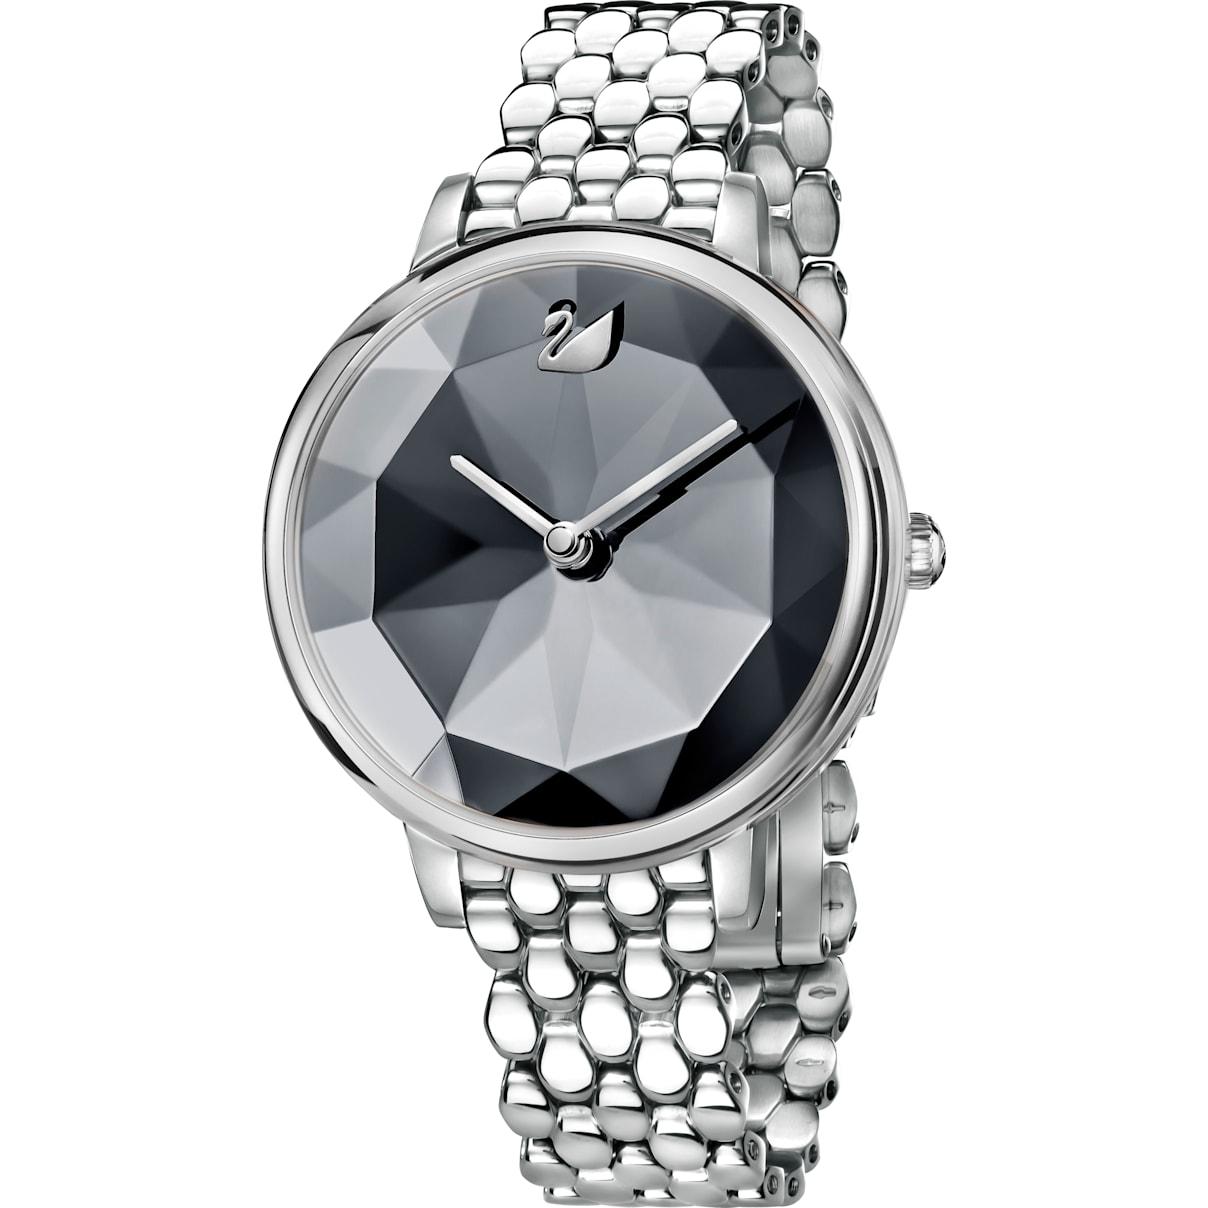 Swarovski Crystal Lake Watch, Metal bracelet, Dark Gray, Stainless steel